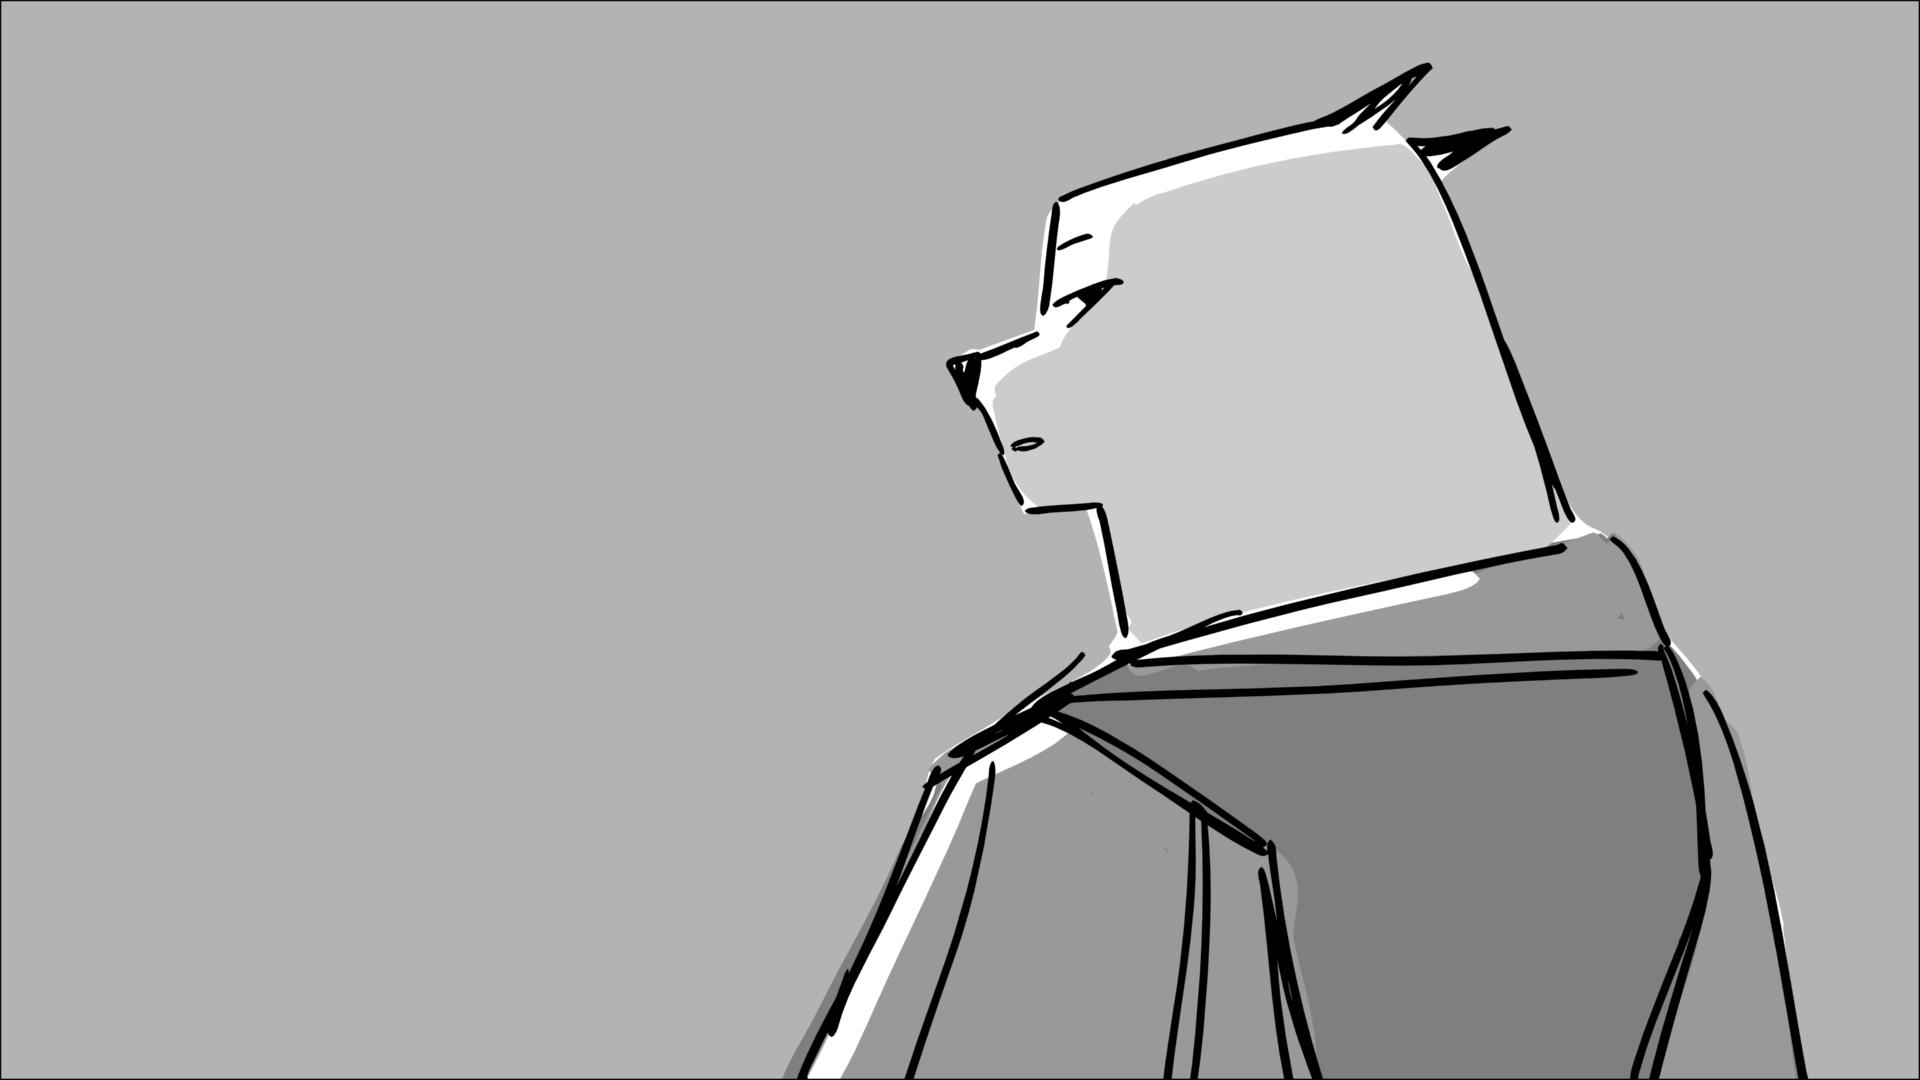 Blades of Furry-000032-02.jpg